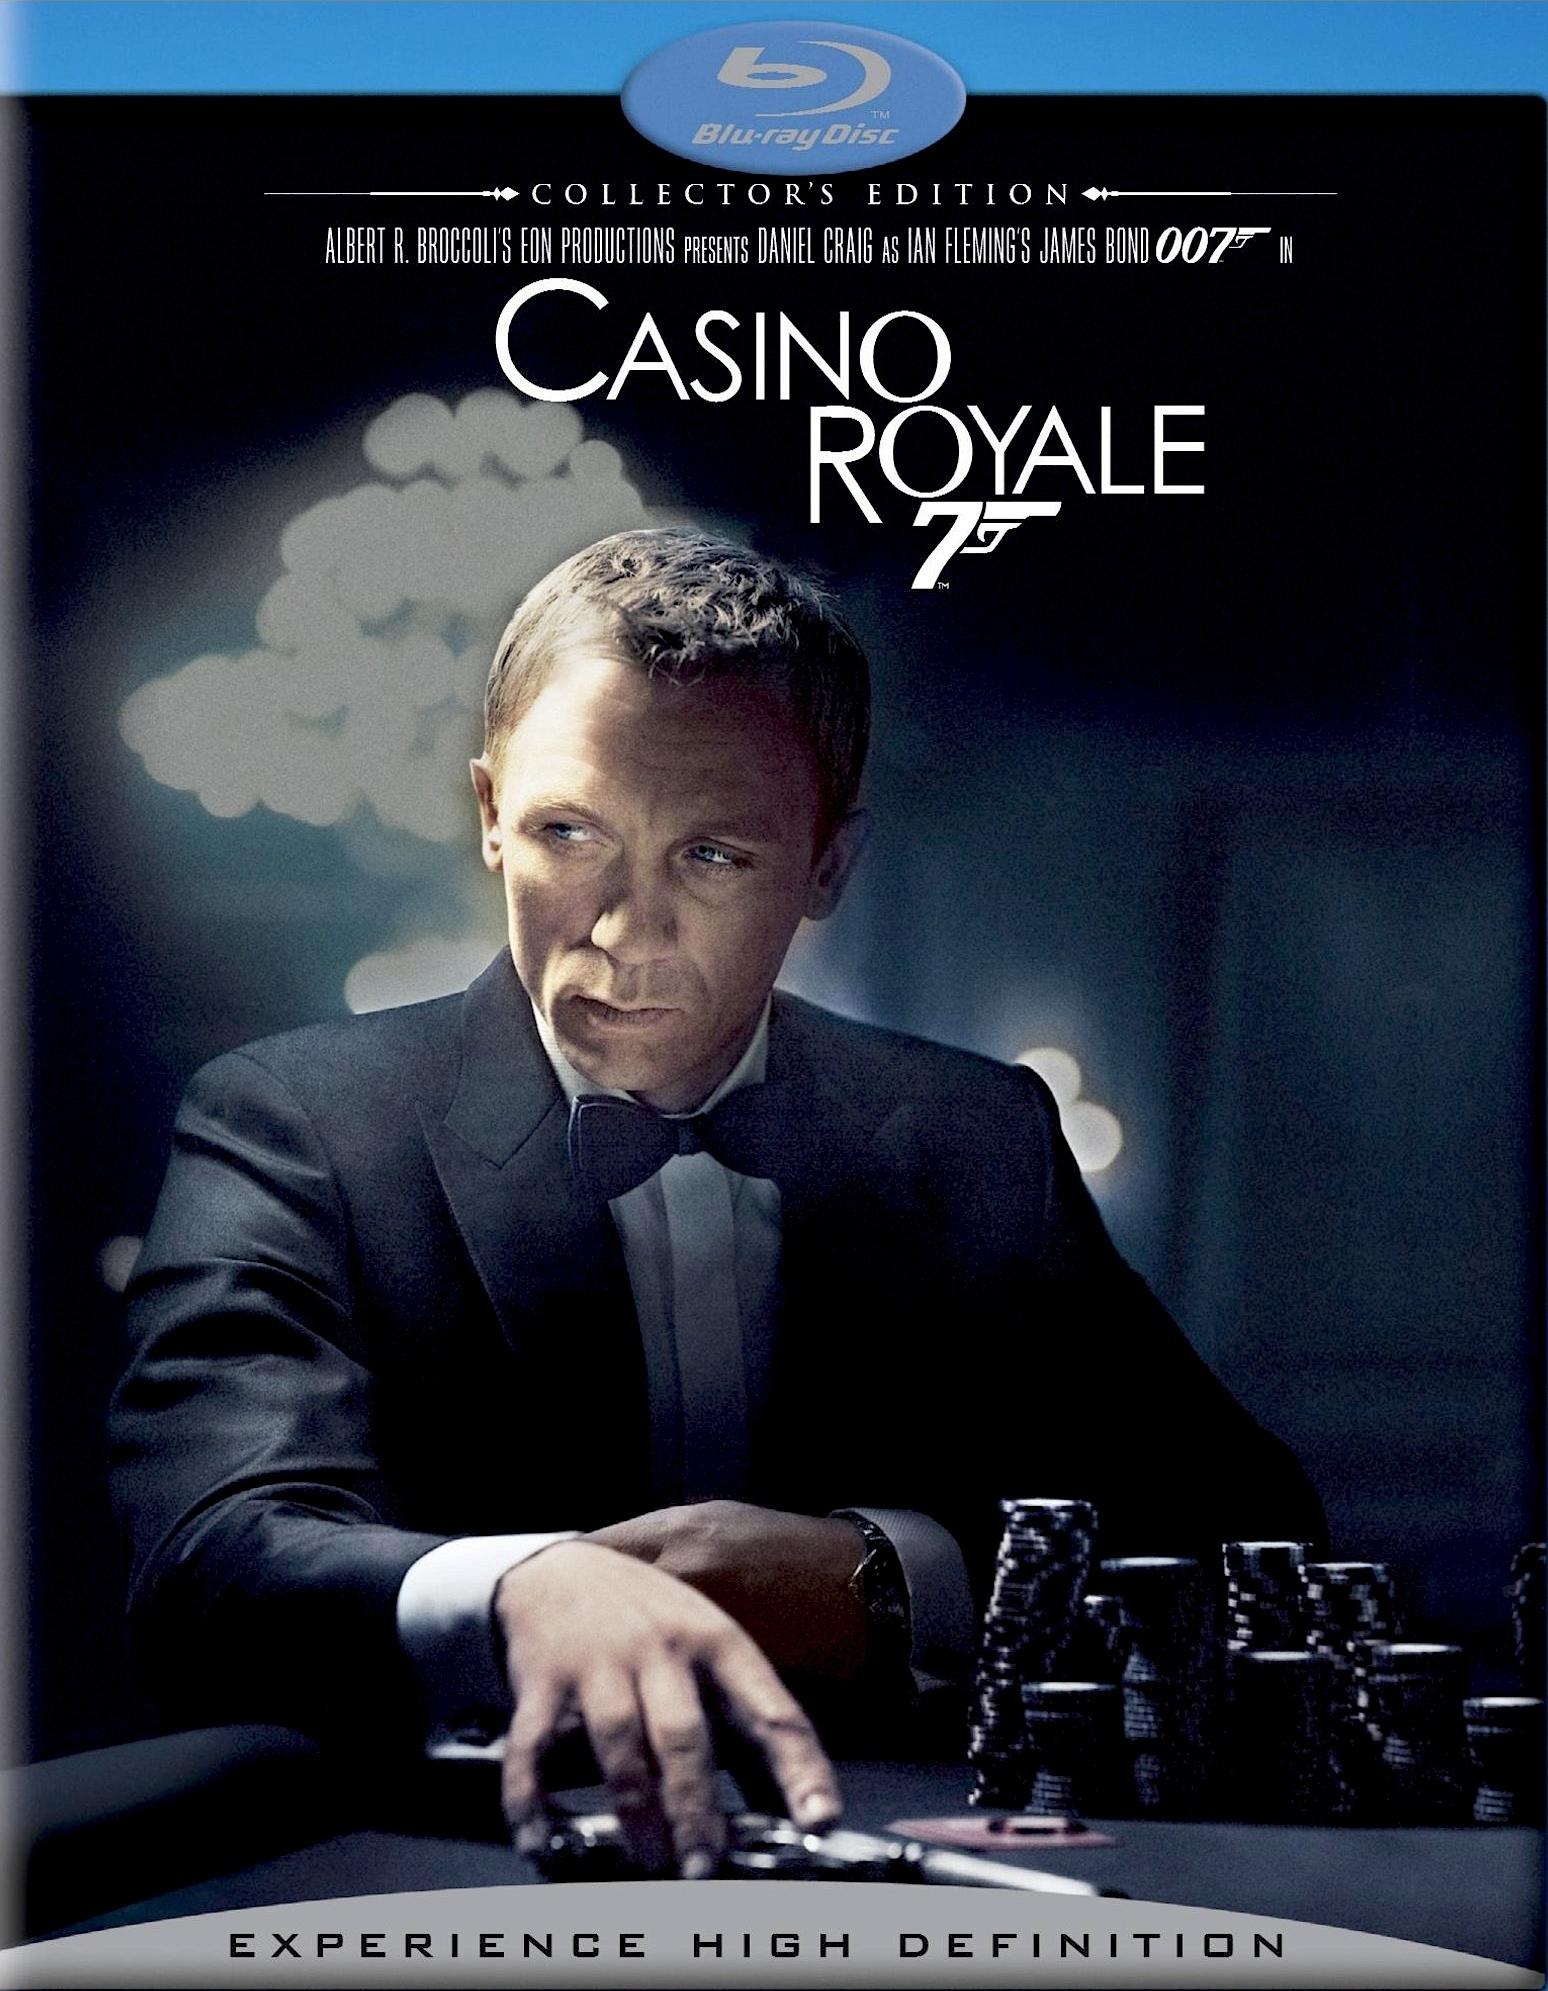 Casino royale watch online blu ray slot machine charm in sterling silver pandora